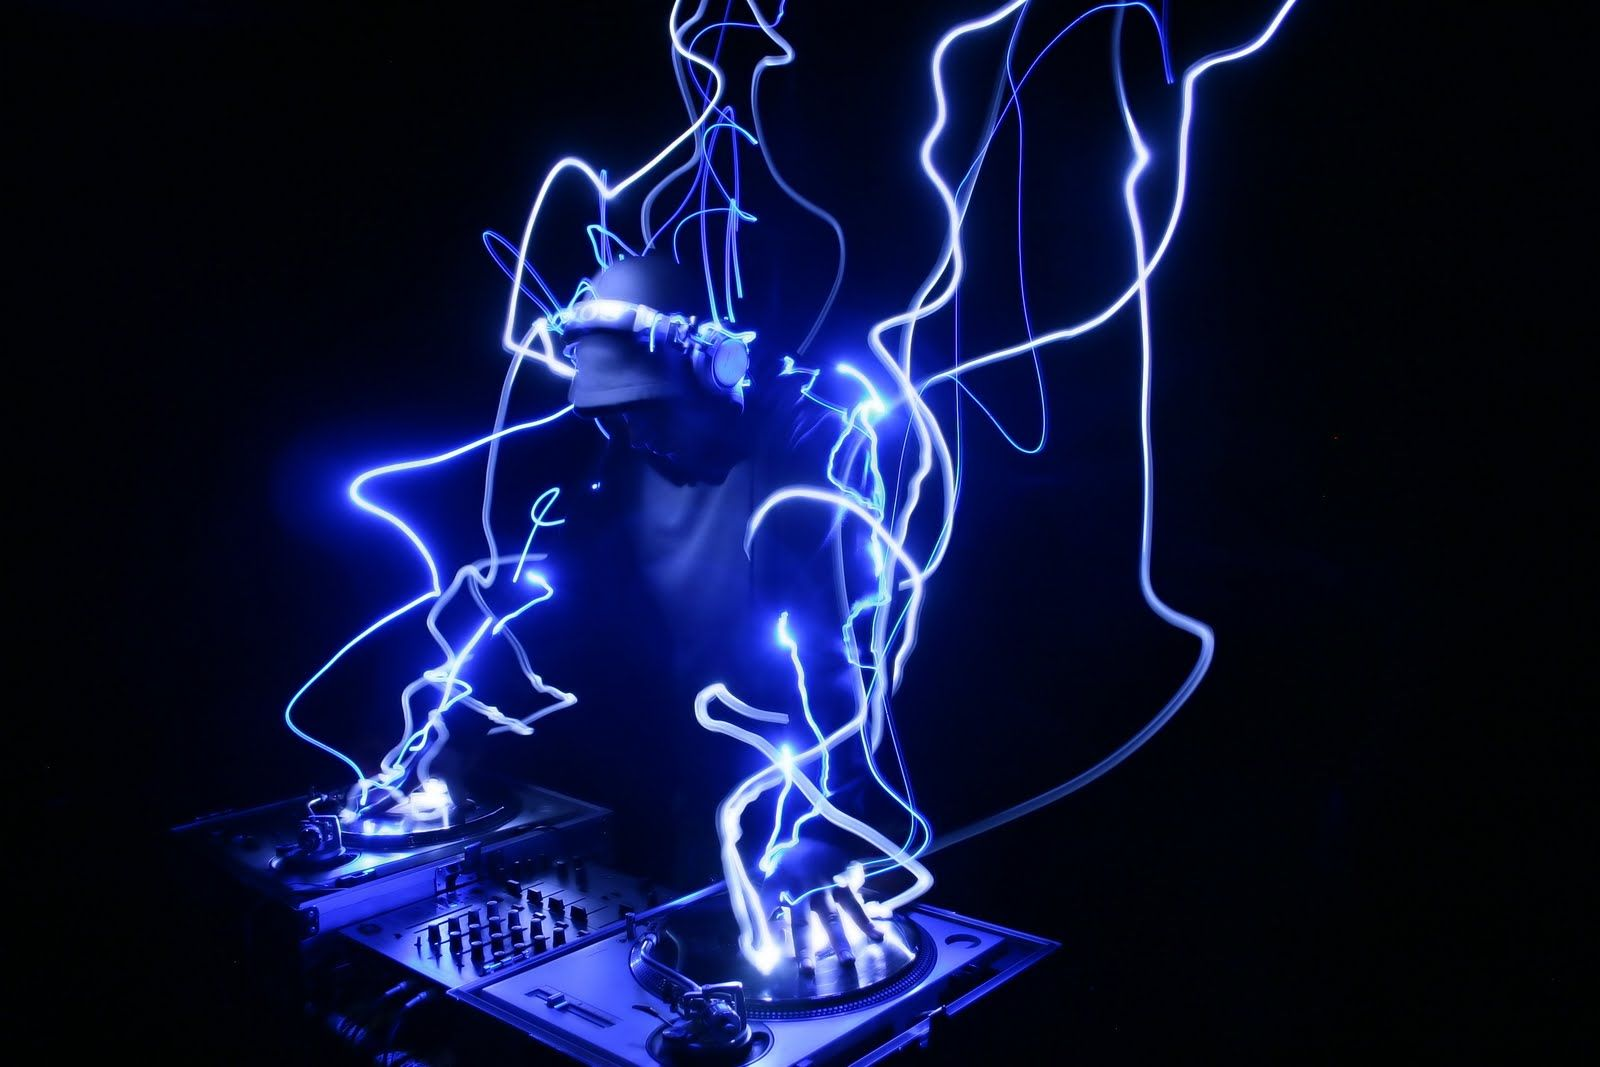 Electro Music Background Electro music background Electronic 1600x1067